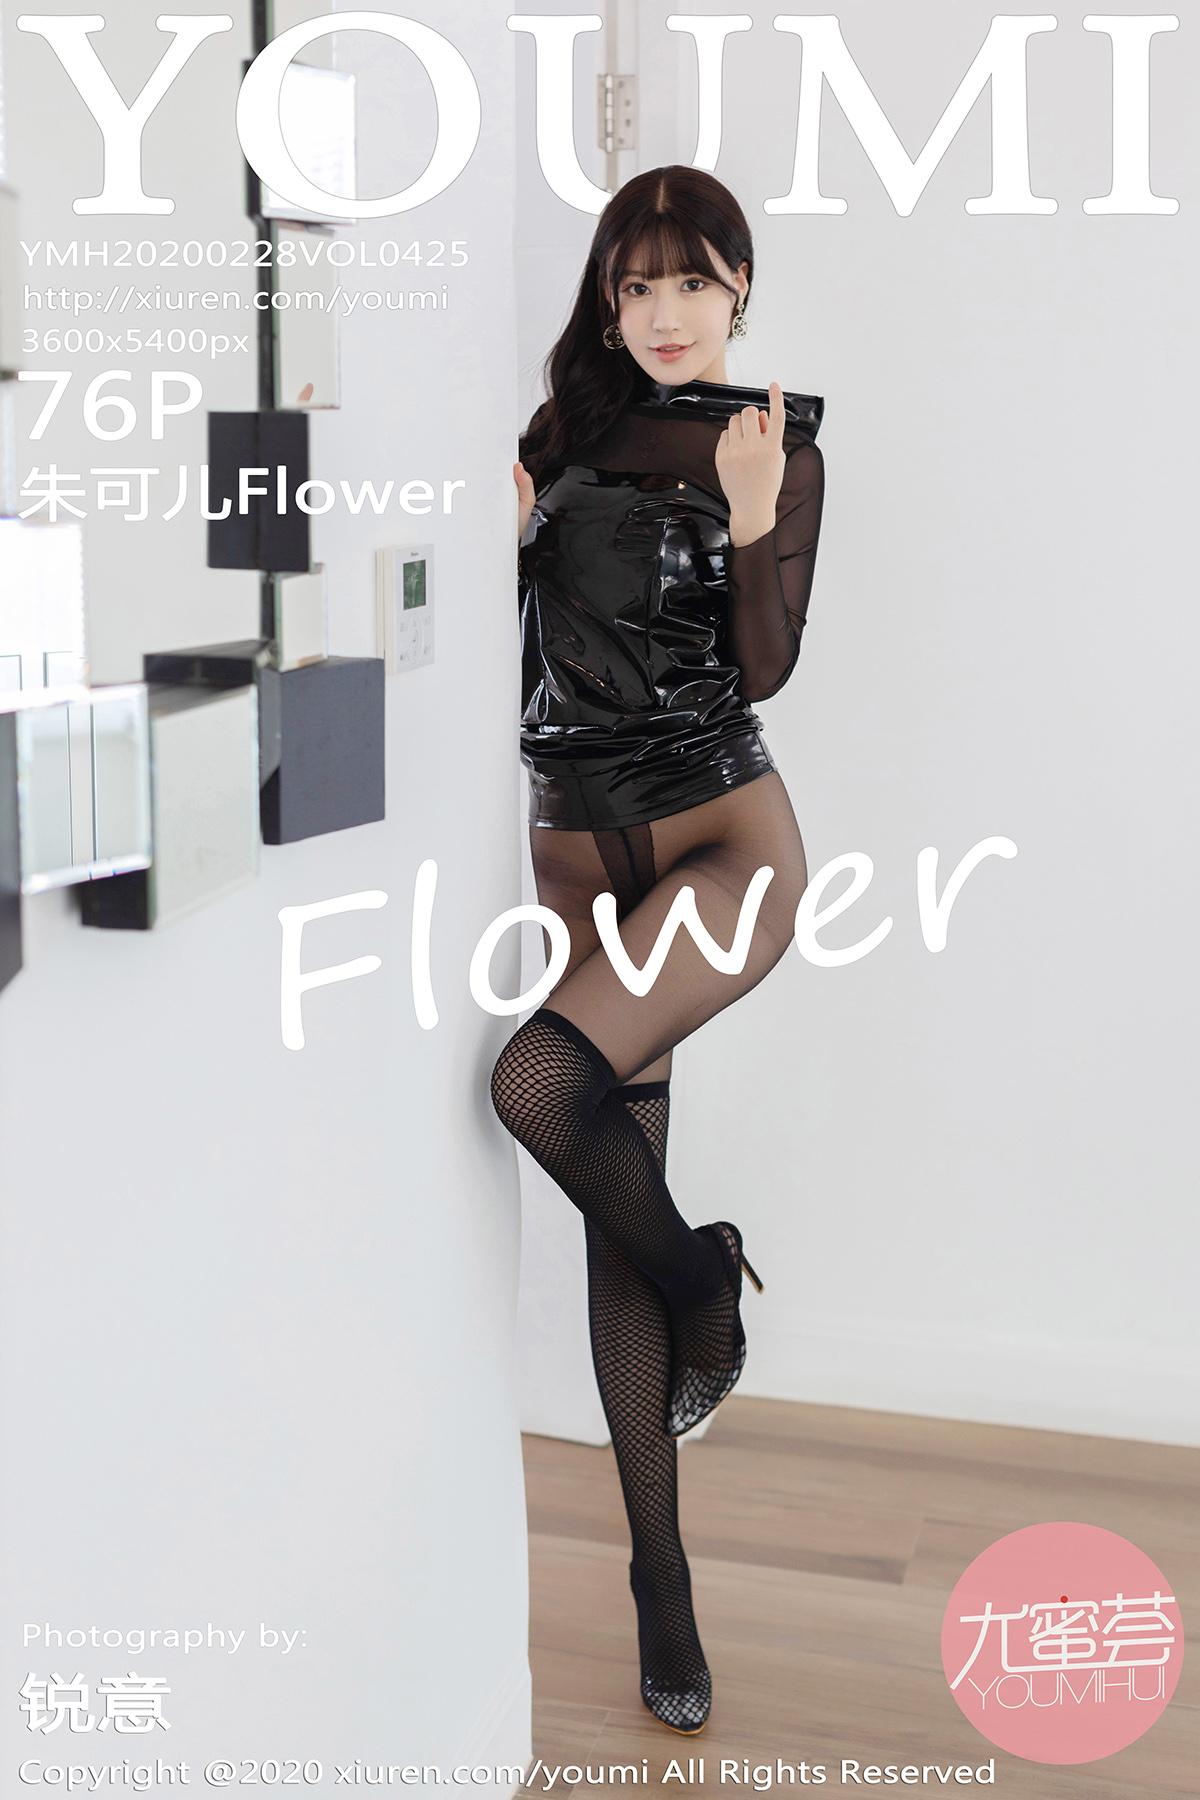 [YOUMI尤蜜荟]2020.02.28 VOL.425 朱可儿Flower 皮衣 网袜[/277MB]